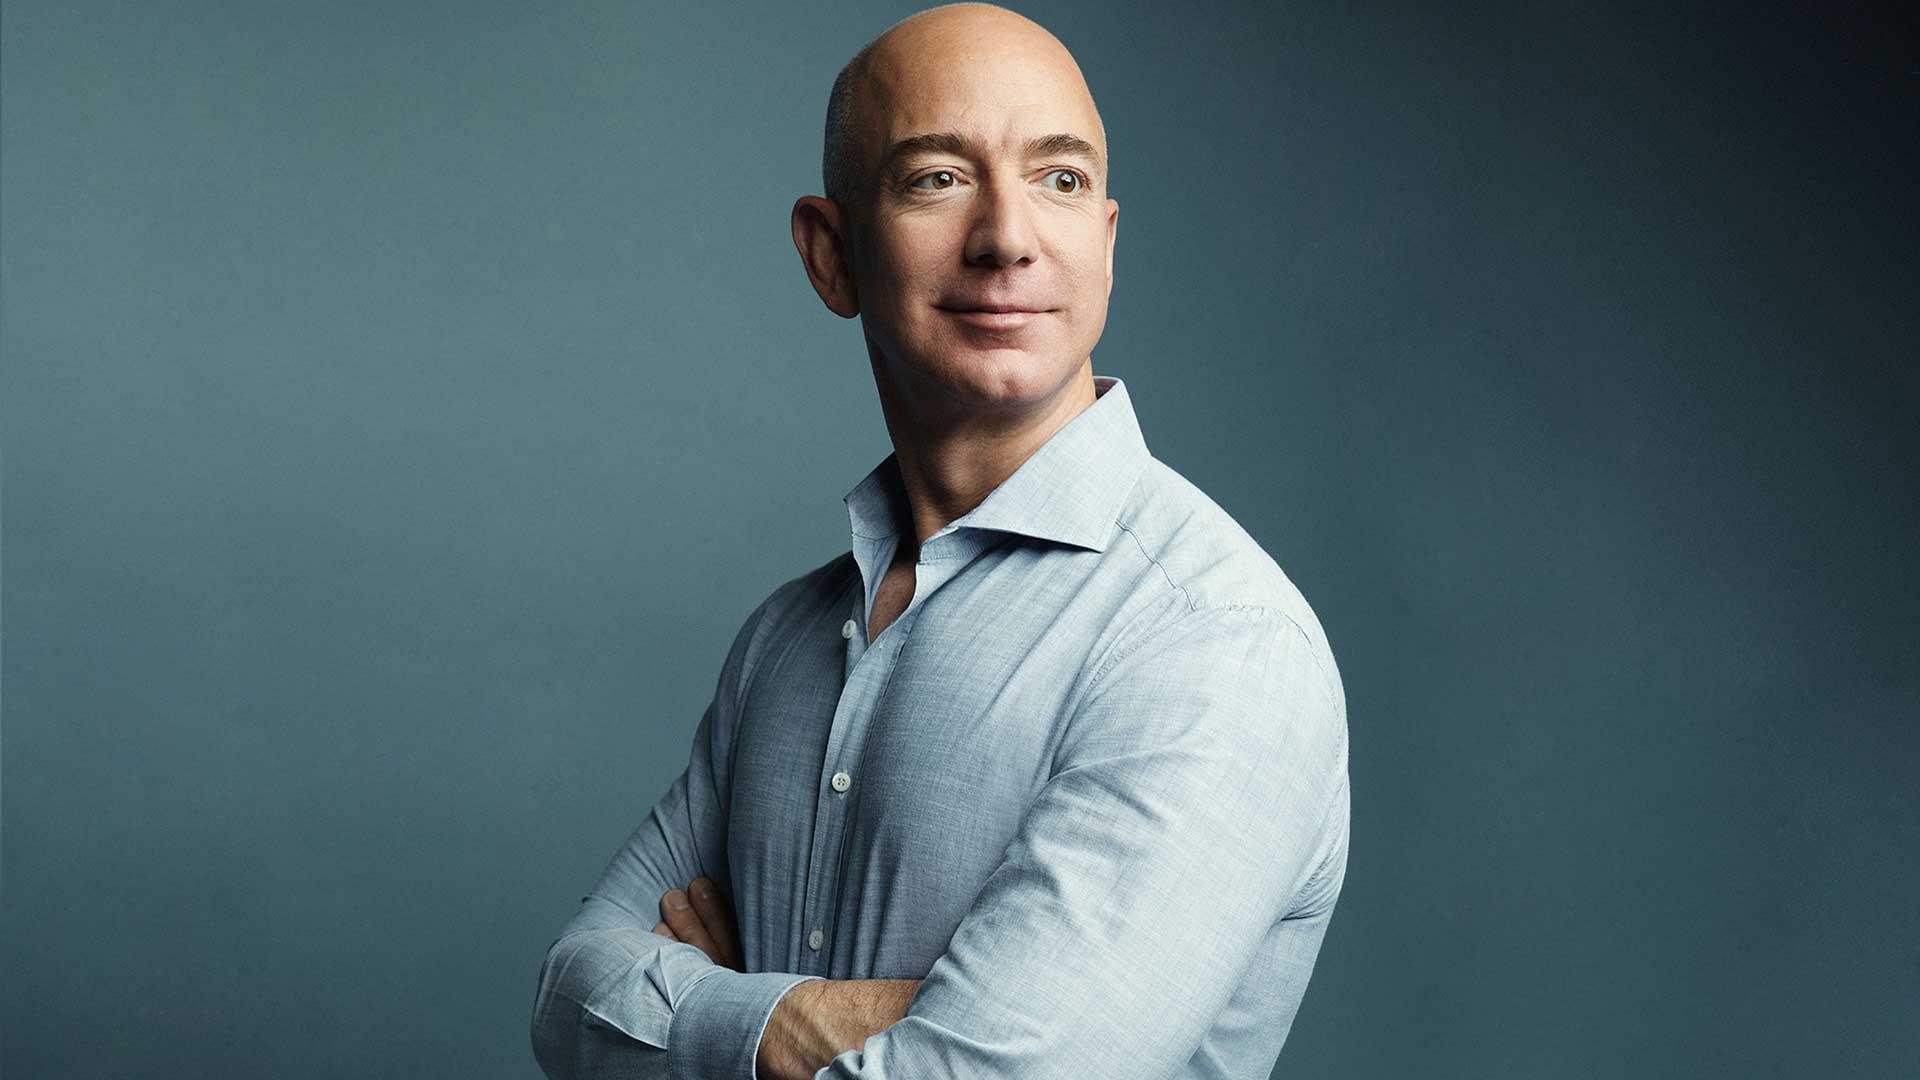 Jeff Bezos Leadership Style Analysed